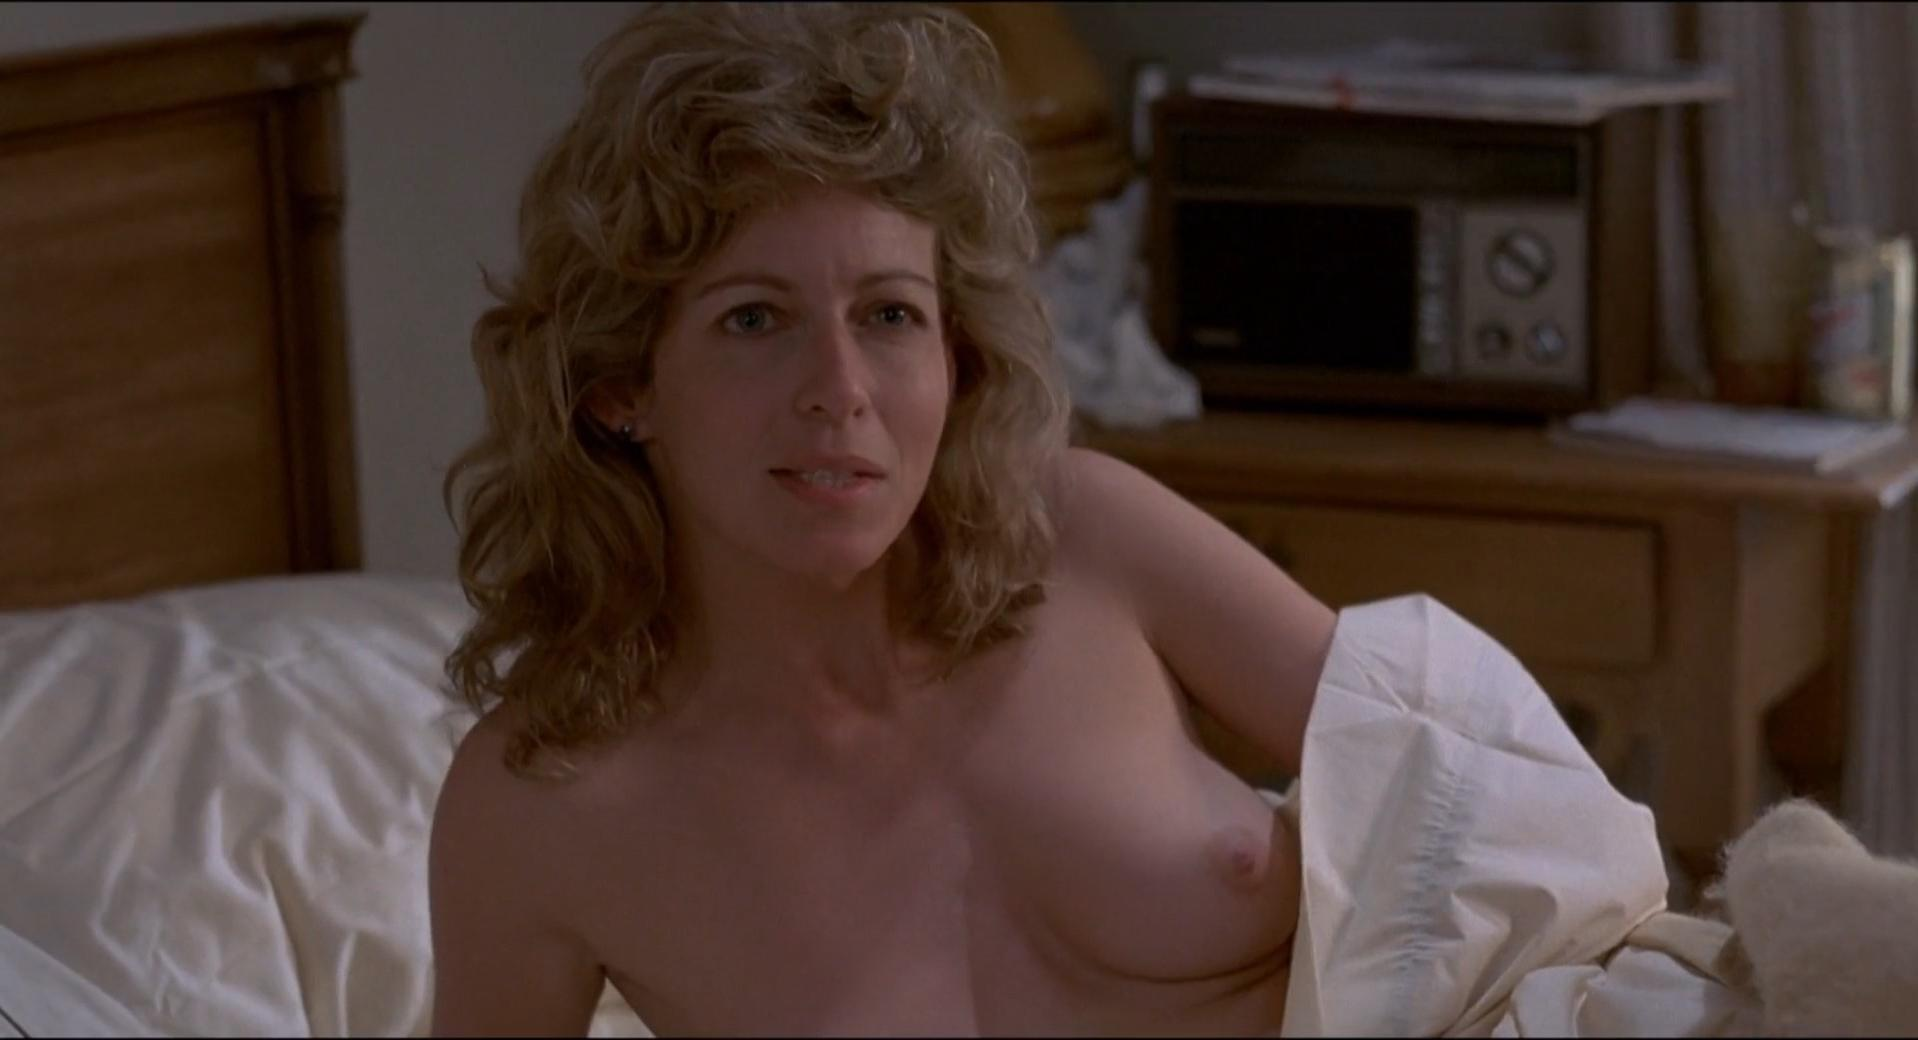 JoBeth Williams nude, Julia Jennings nude - Teachers (1984)